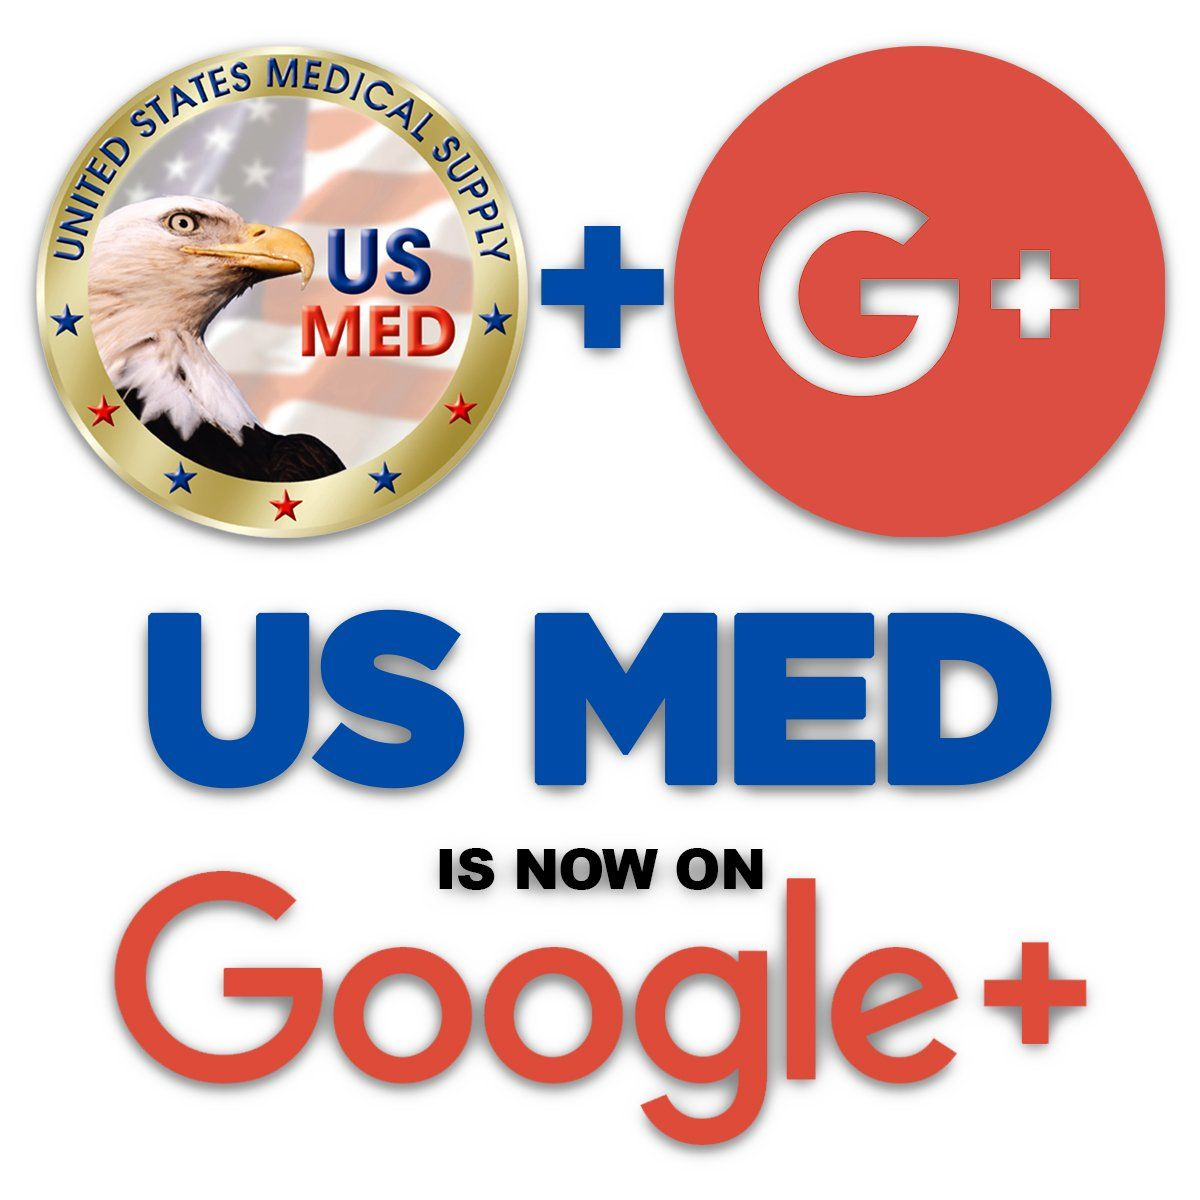 United States Medical Supply, LLC now on Twitter! | US MED | Medical